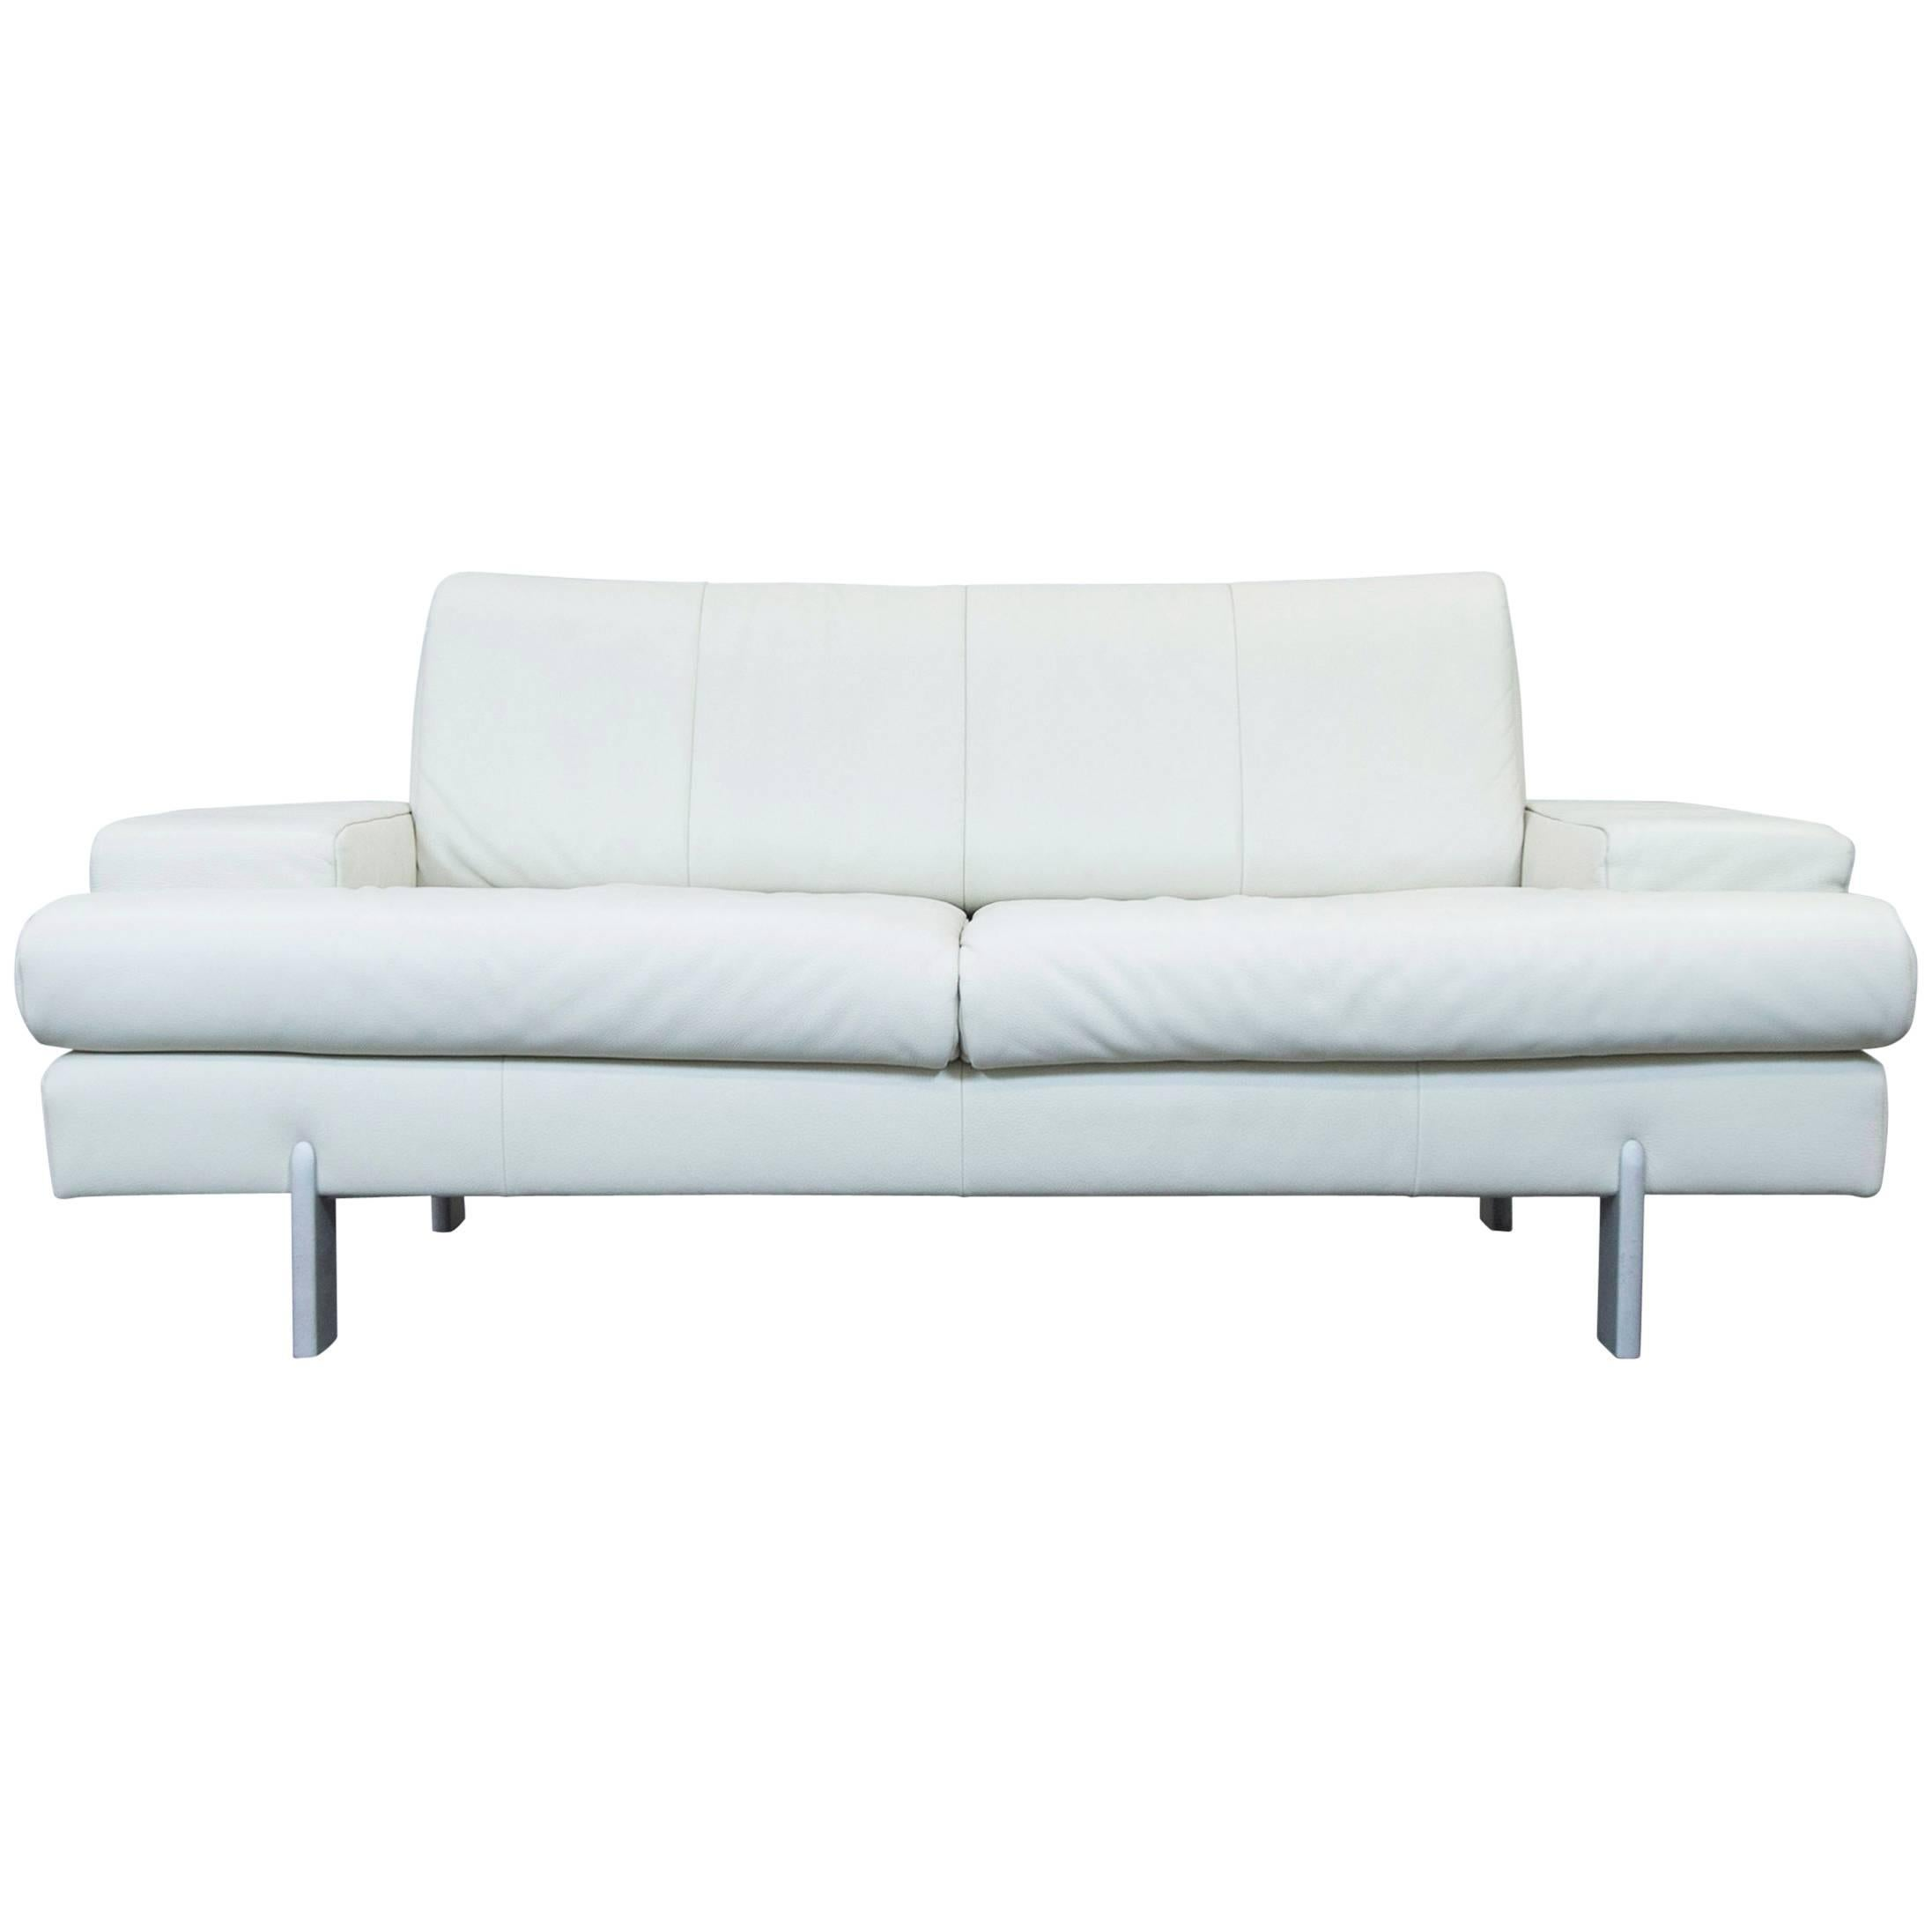 benz sofas benz sofas with benz sofas free with benz sofas vivacious living room with black. Black Bedroom Furniture Sets. Home Design Ideas